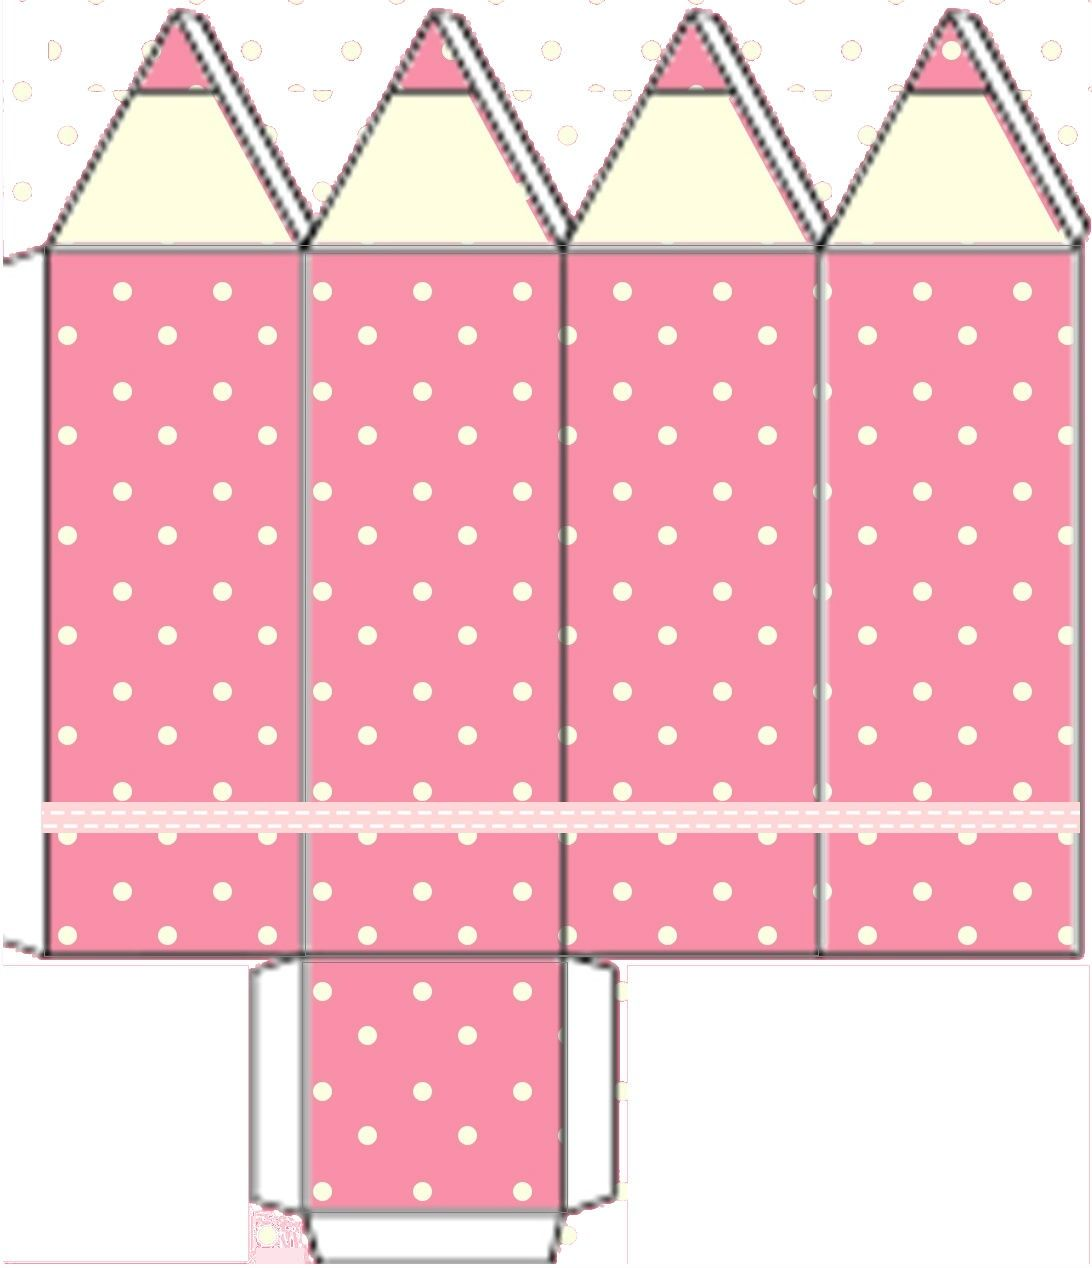 caixa lapis   wiskunde   Pinterest   Cajas, Molde y Papel